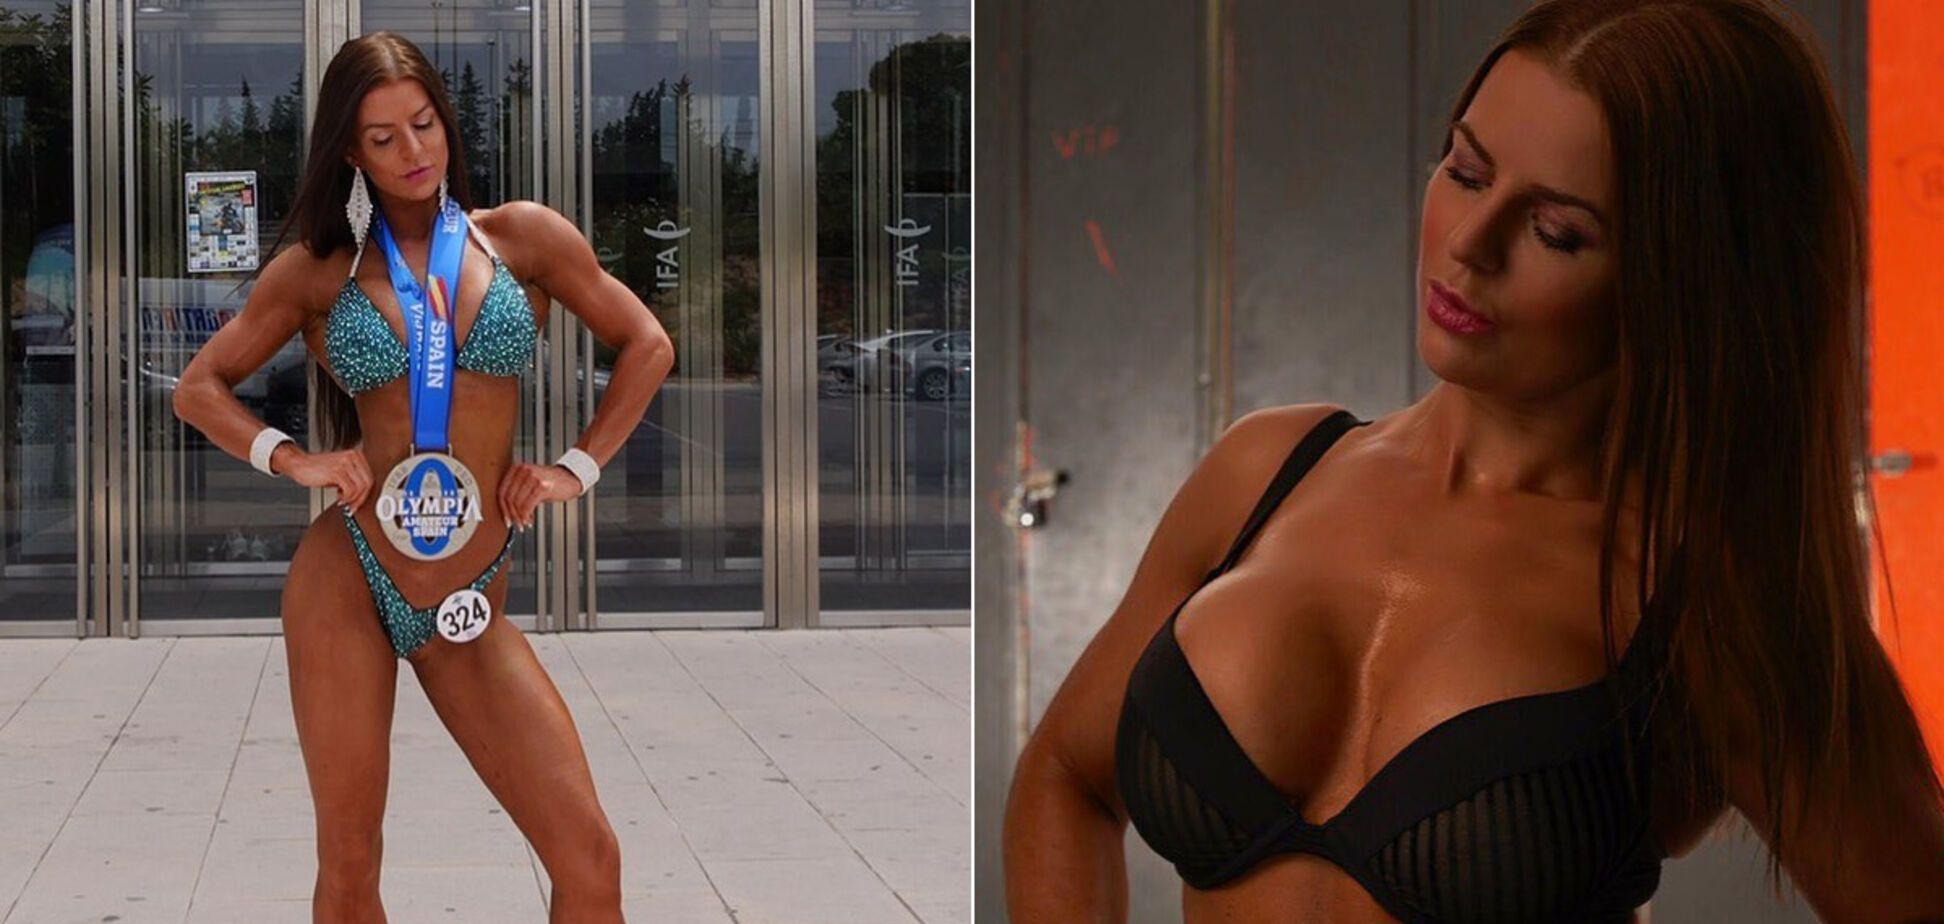 Датська фітнес-модель знялася в незвичайному 'голому' купальнику